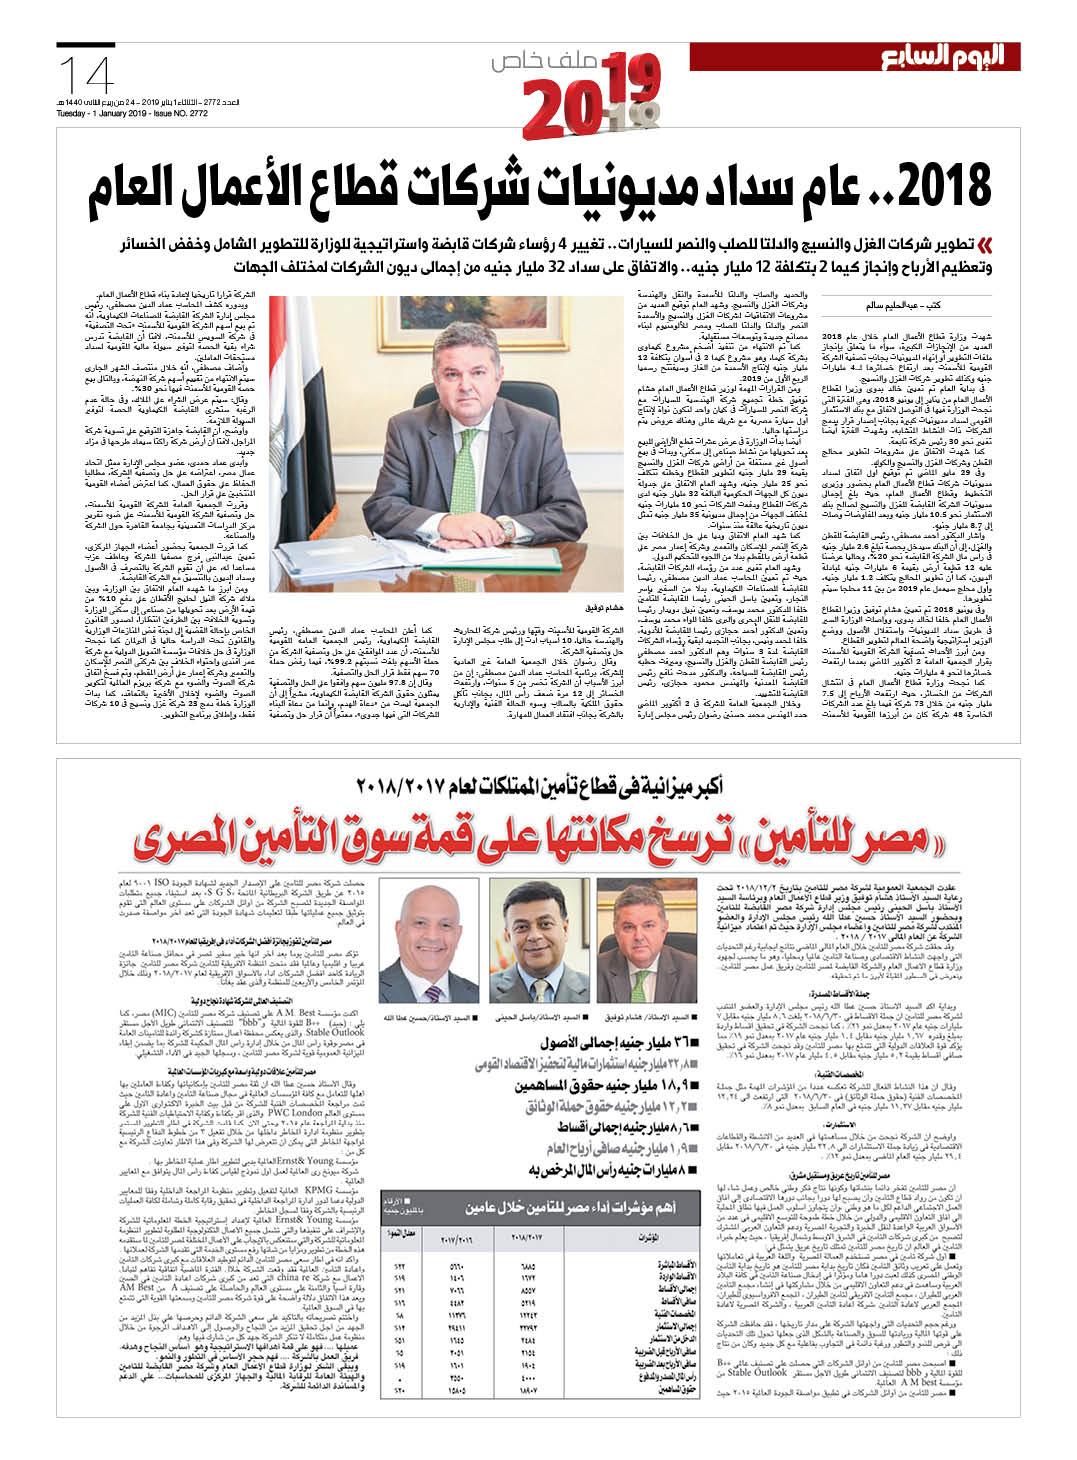 1b3fa9f8f مصر من الإصلاح إلى النجاح.. اقتصاد منطلق فى 2019 نحو آفاق أرحب ...